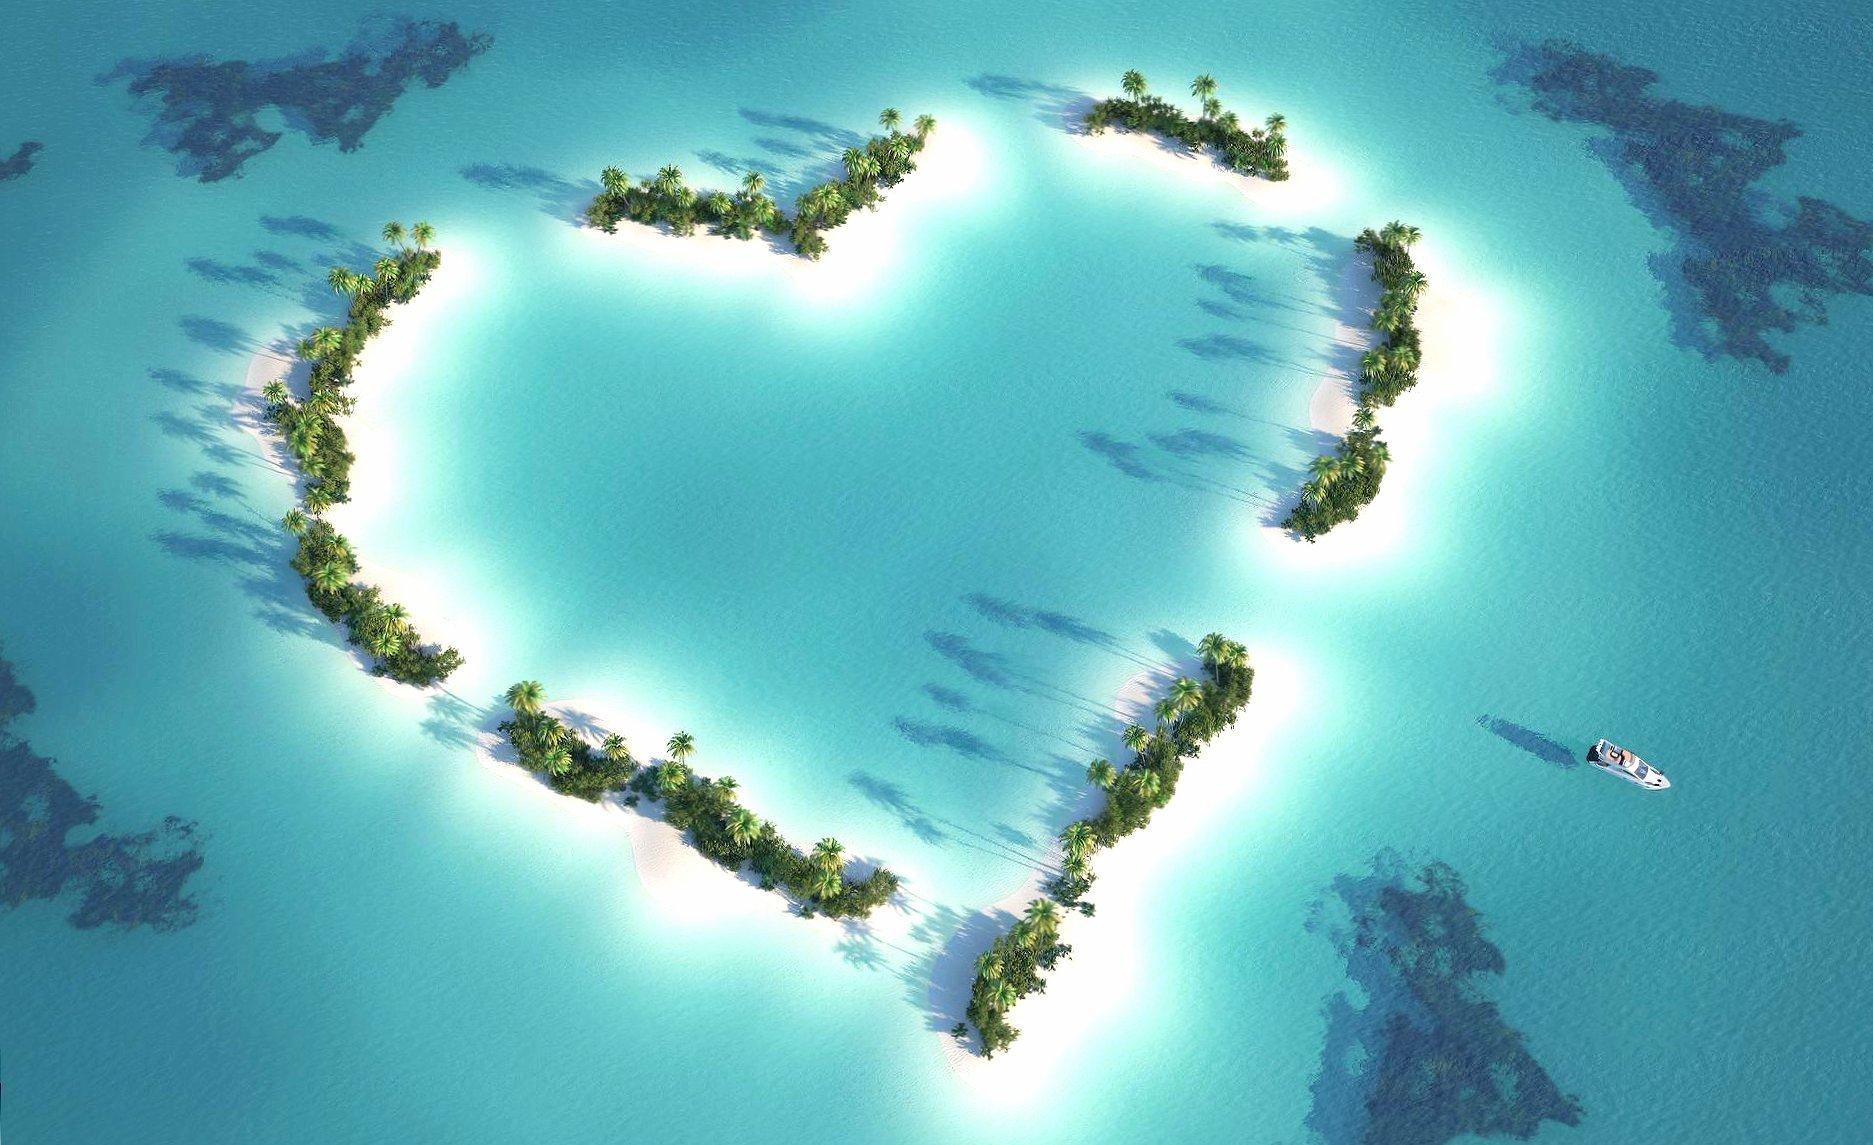 heart island archipelago wallpapers HD quality